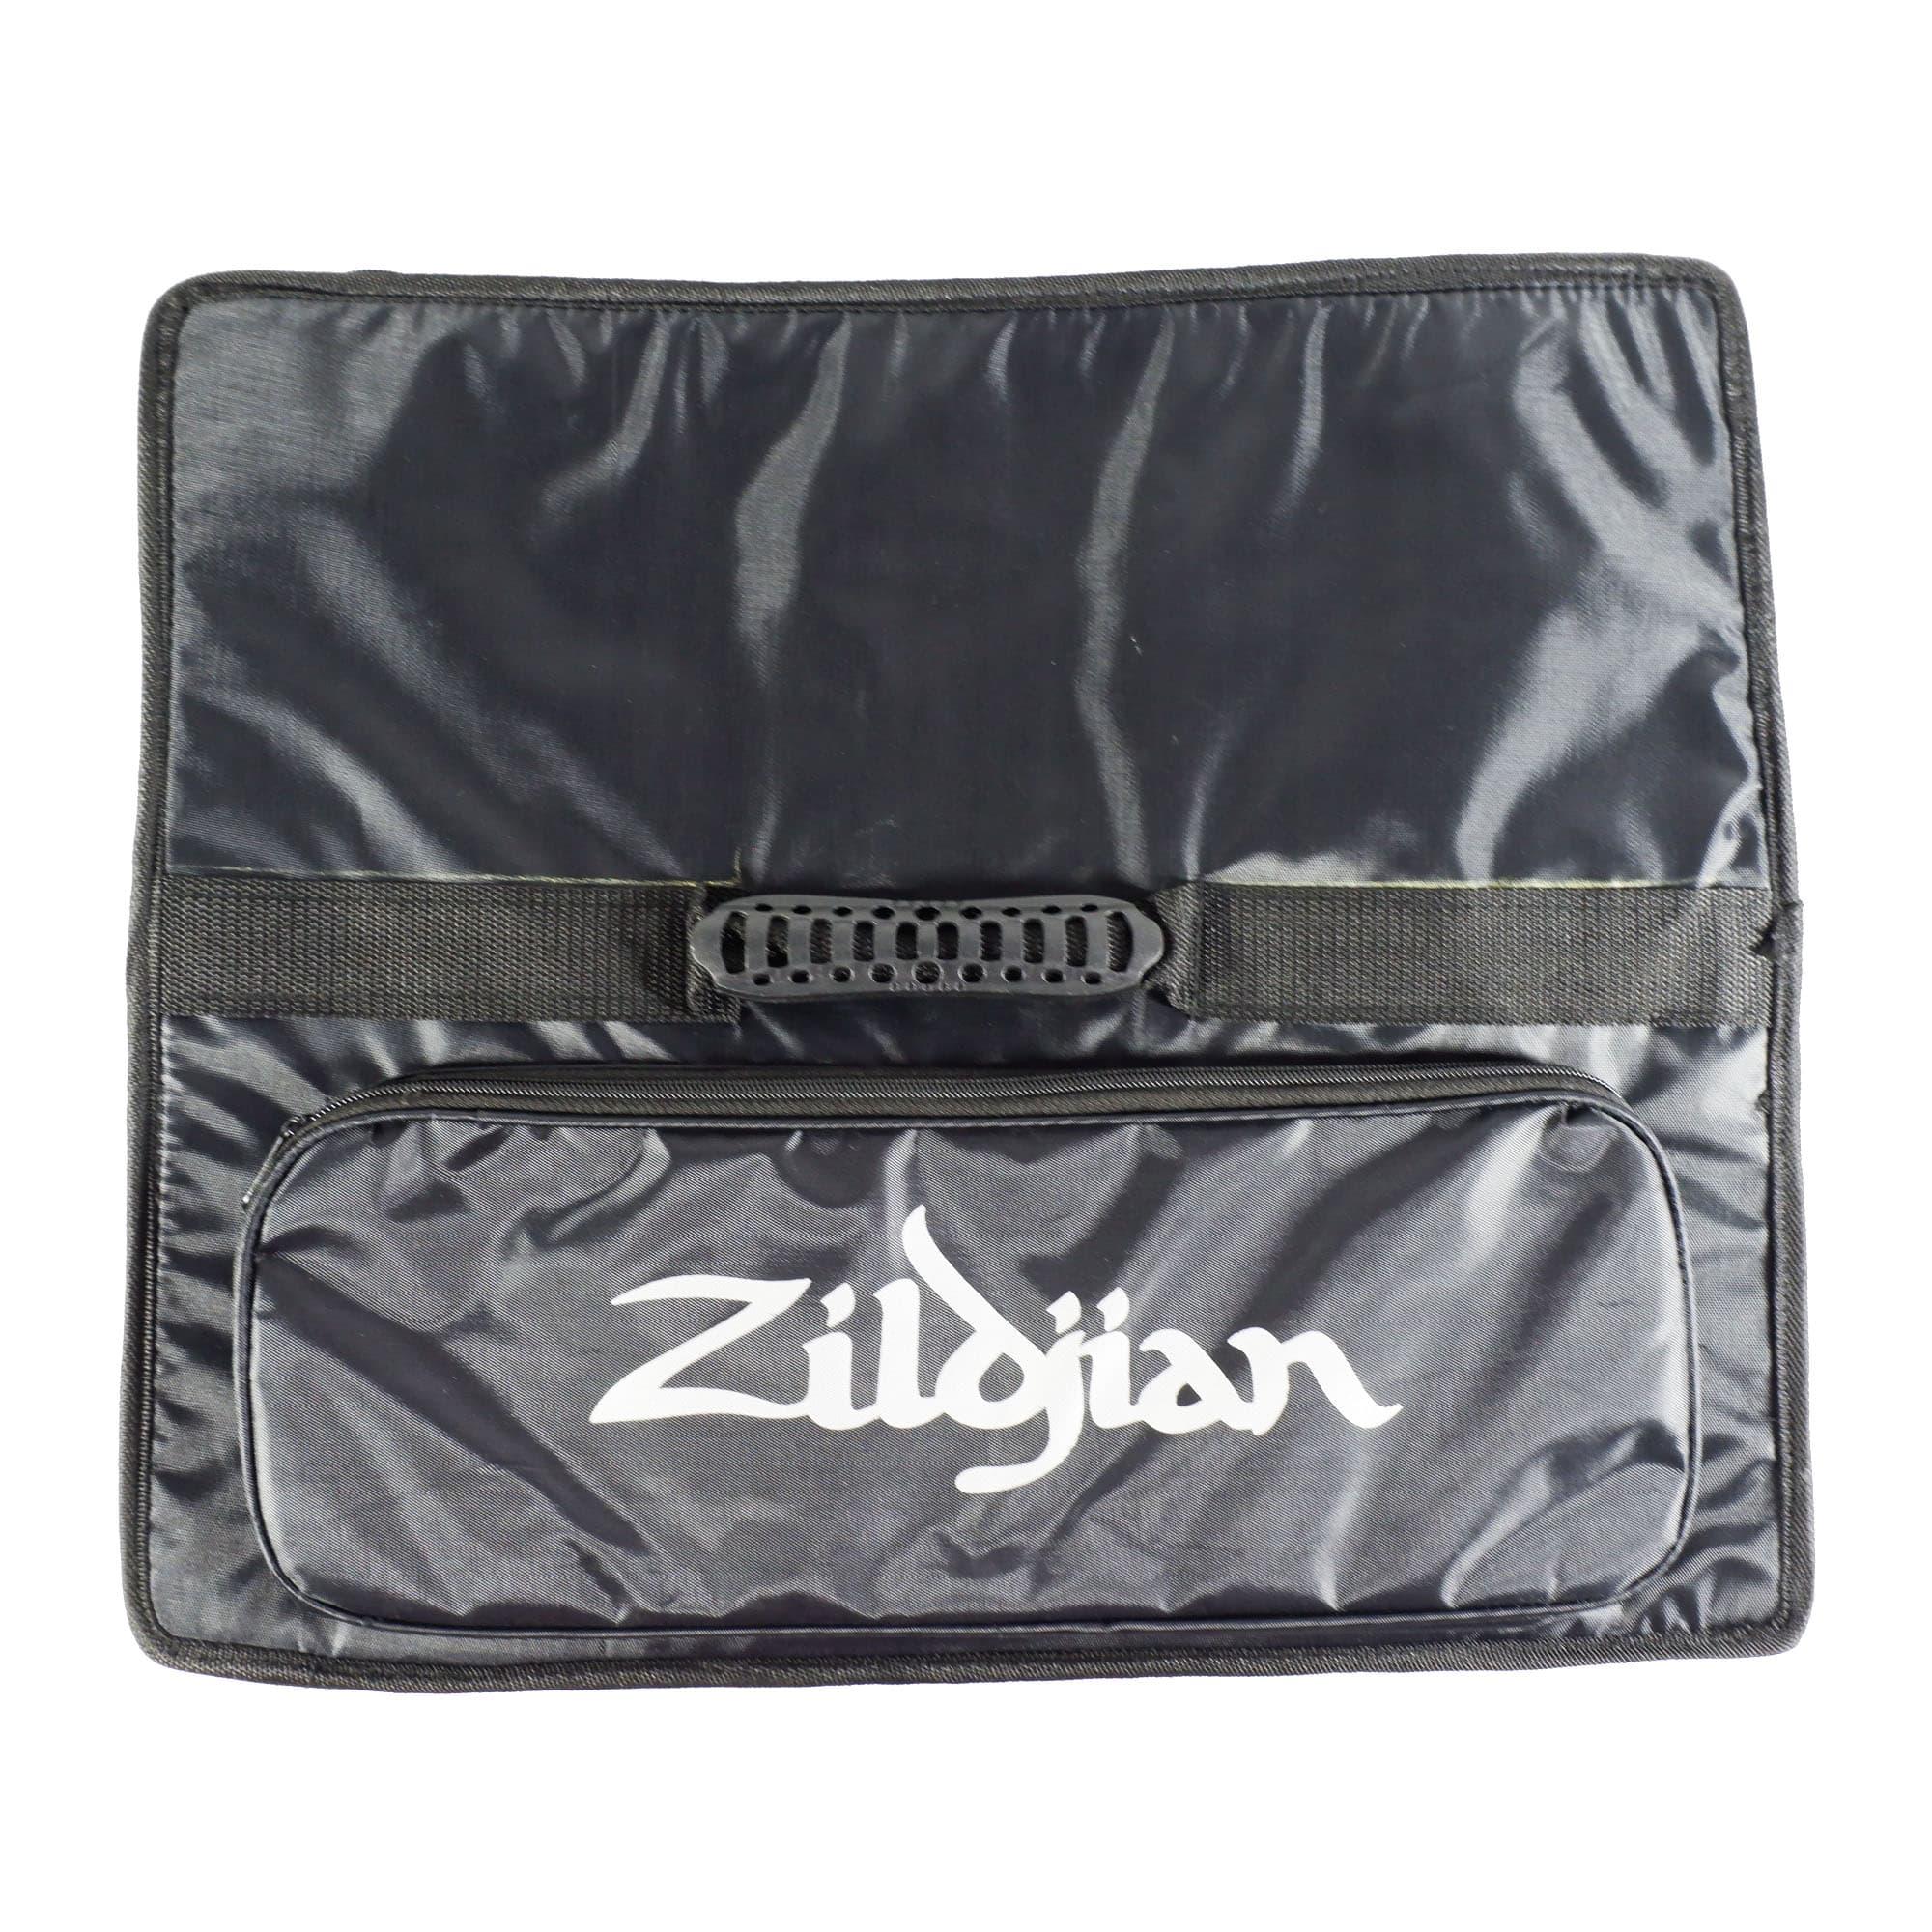 Jual Tas Softcase Stick Drum Zildjian Gigbag Scd 01 Stik Brandos Blanjacom Alat Musik Tama Sonor